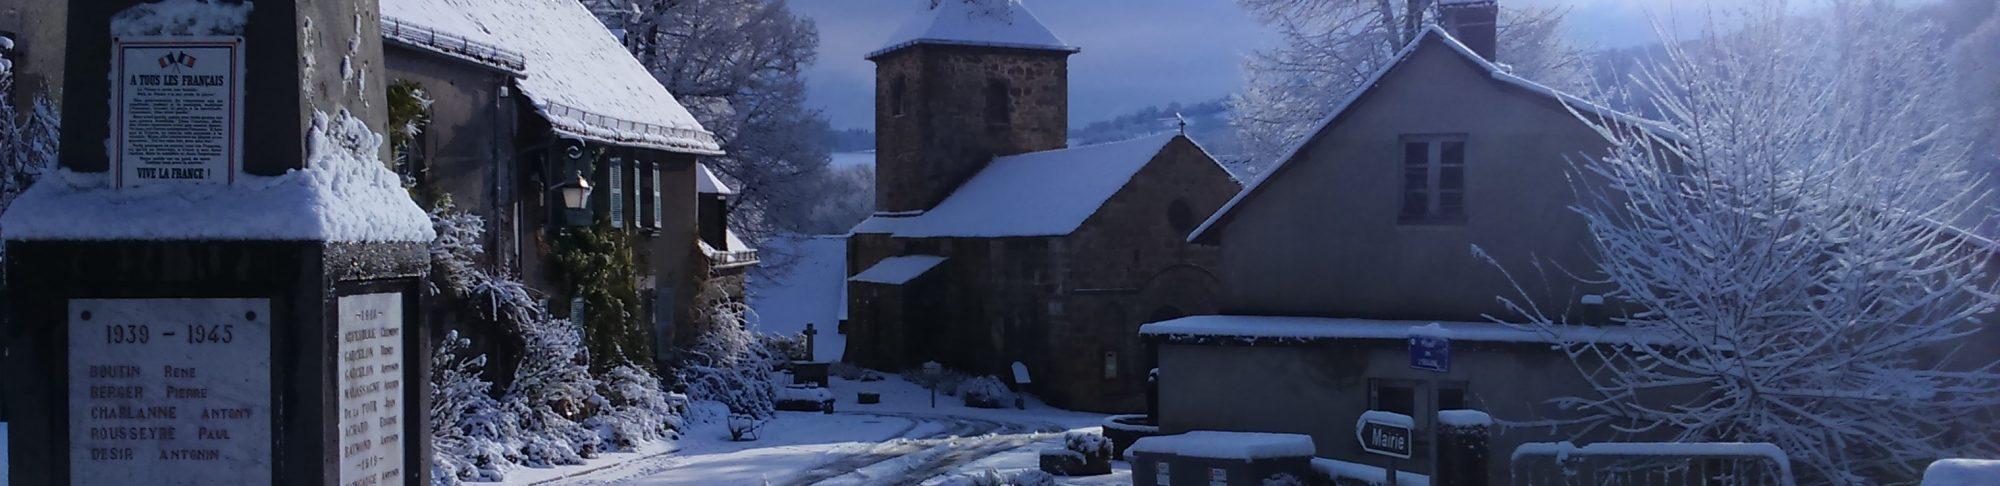 jaleyrac neige 3